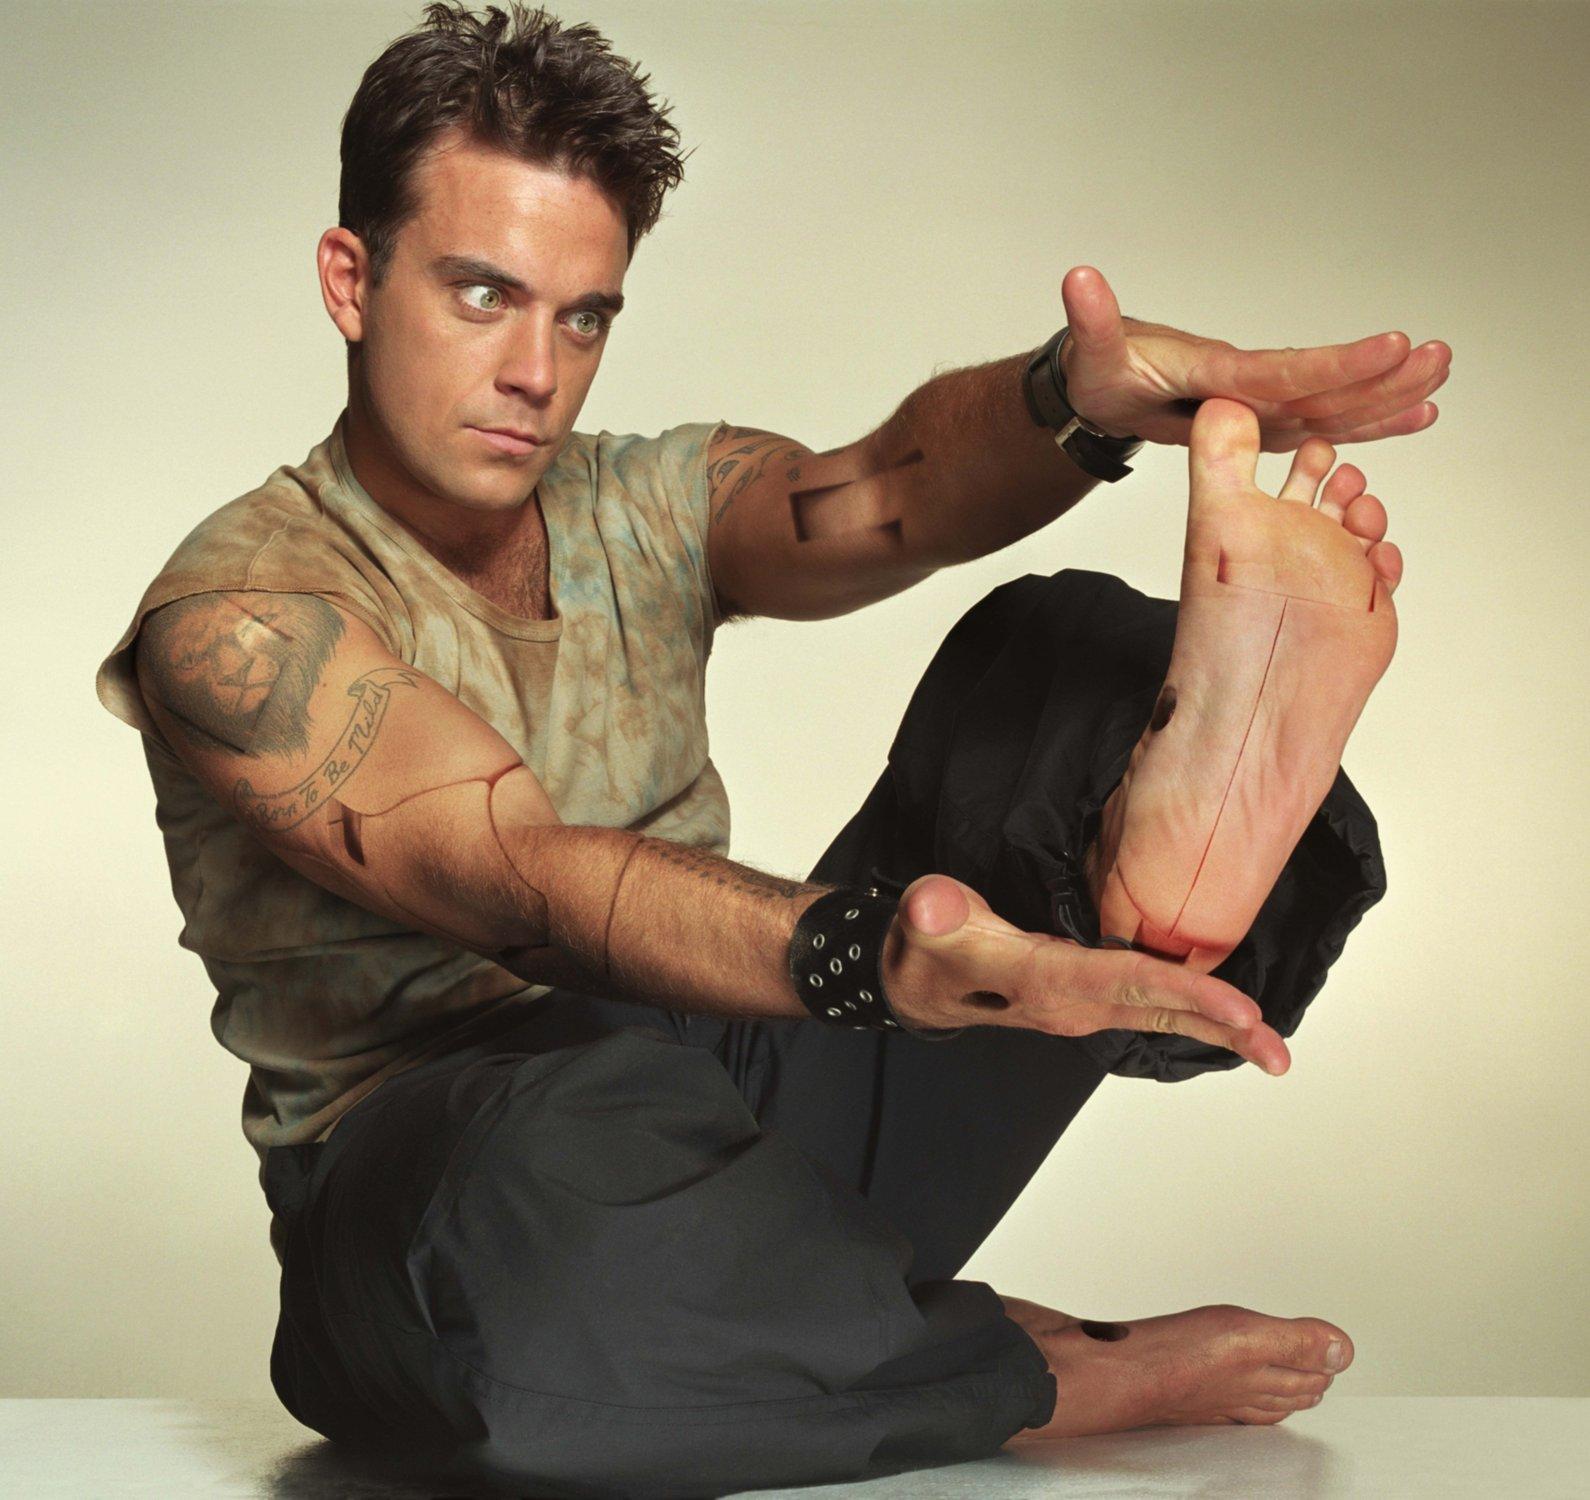 http://3.bp.blogspot.com/-HRRB2NqvtVY/UApItdPxzXI/AAAAAAAAFh4/83HIXMauVNM/s1600/robbie_williams_feet.jpeg